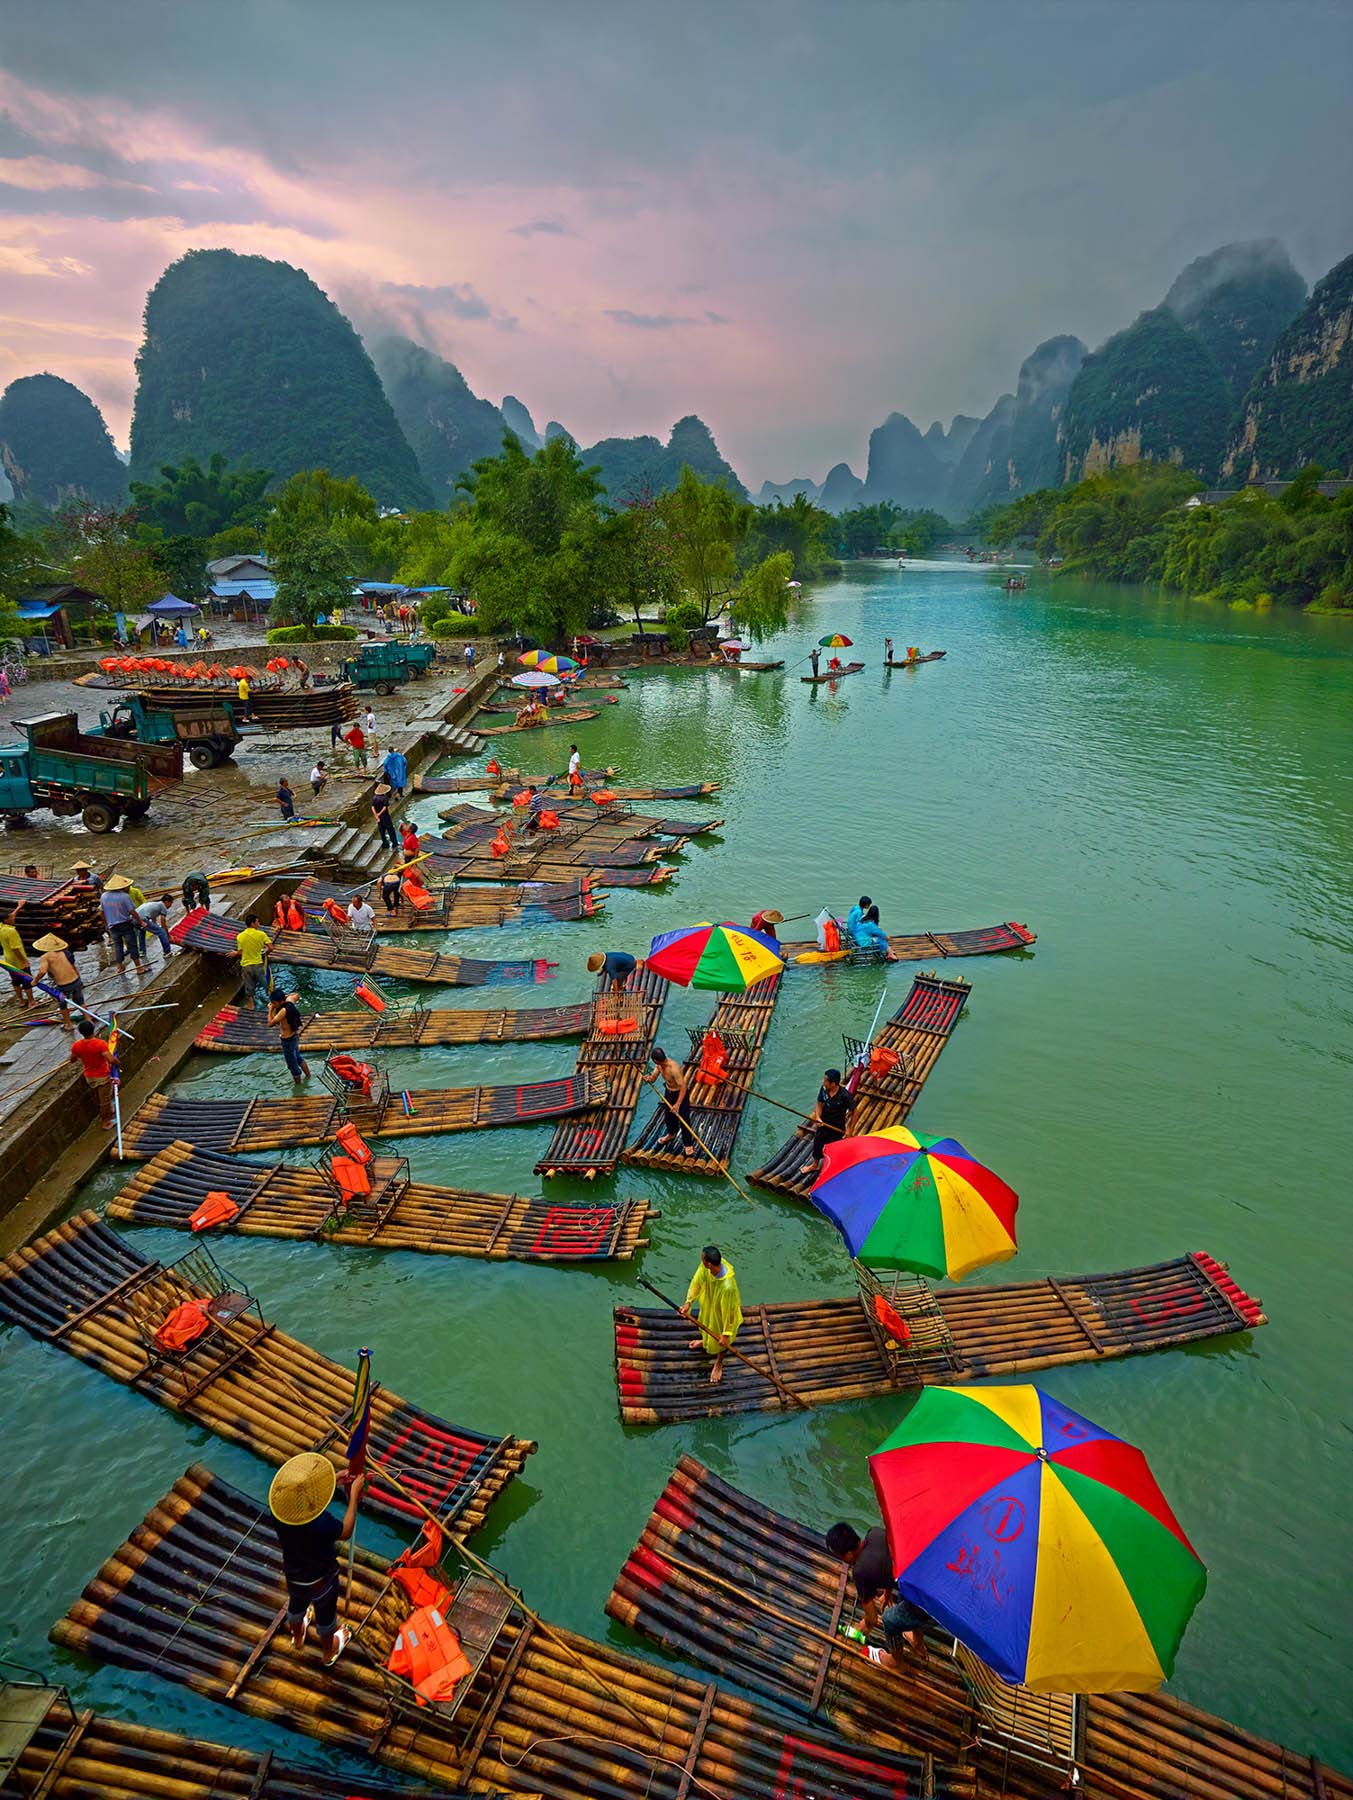 People loading boats on Jade Dragon River, Guilin, China.